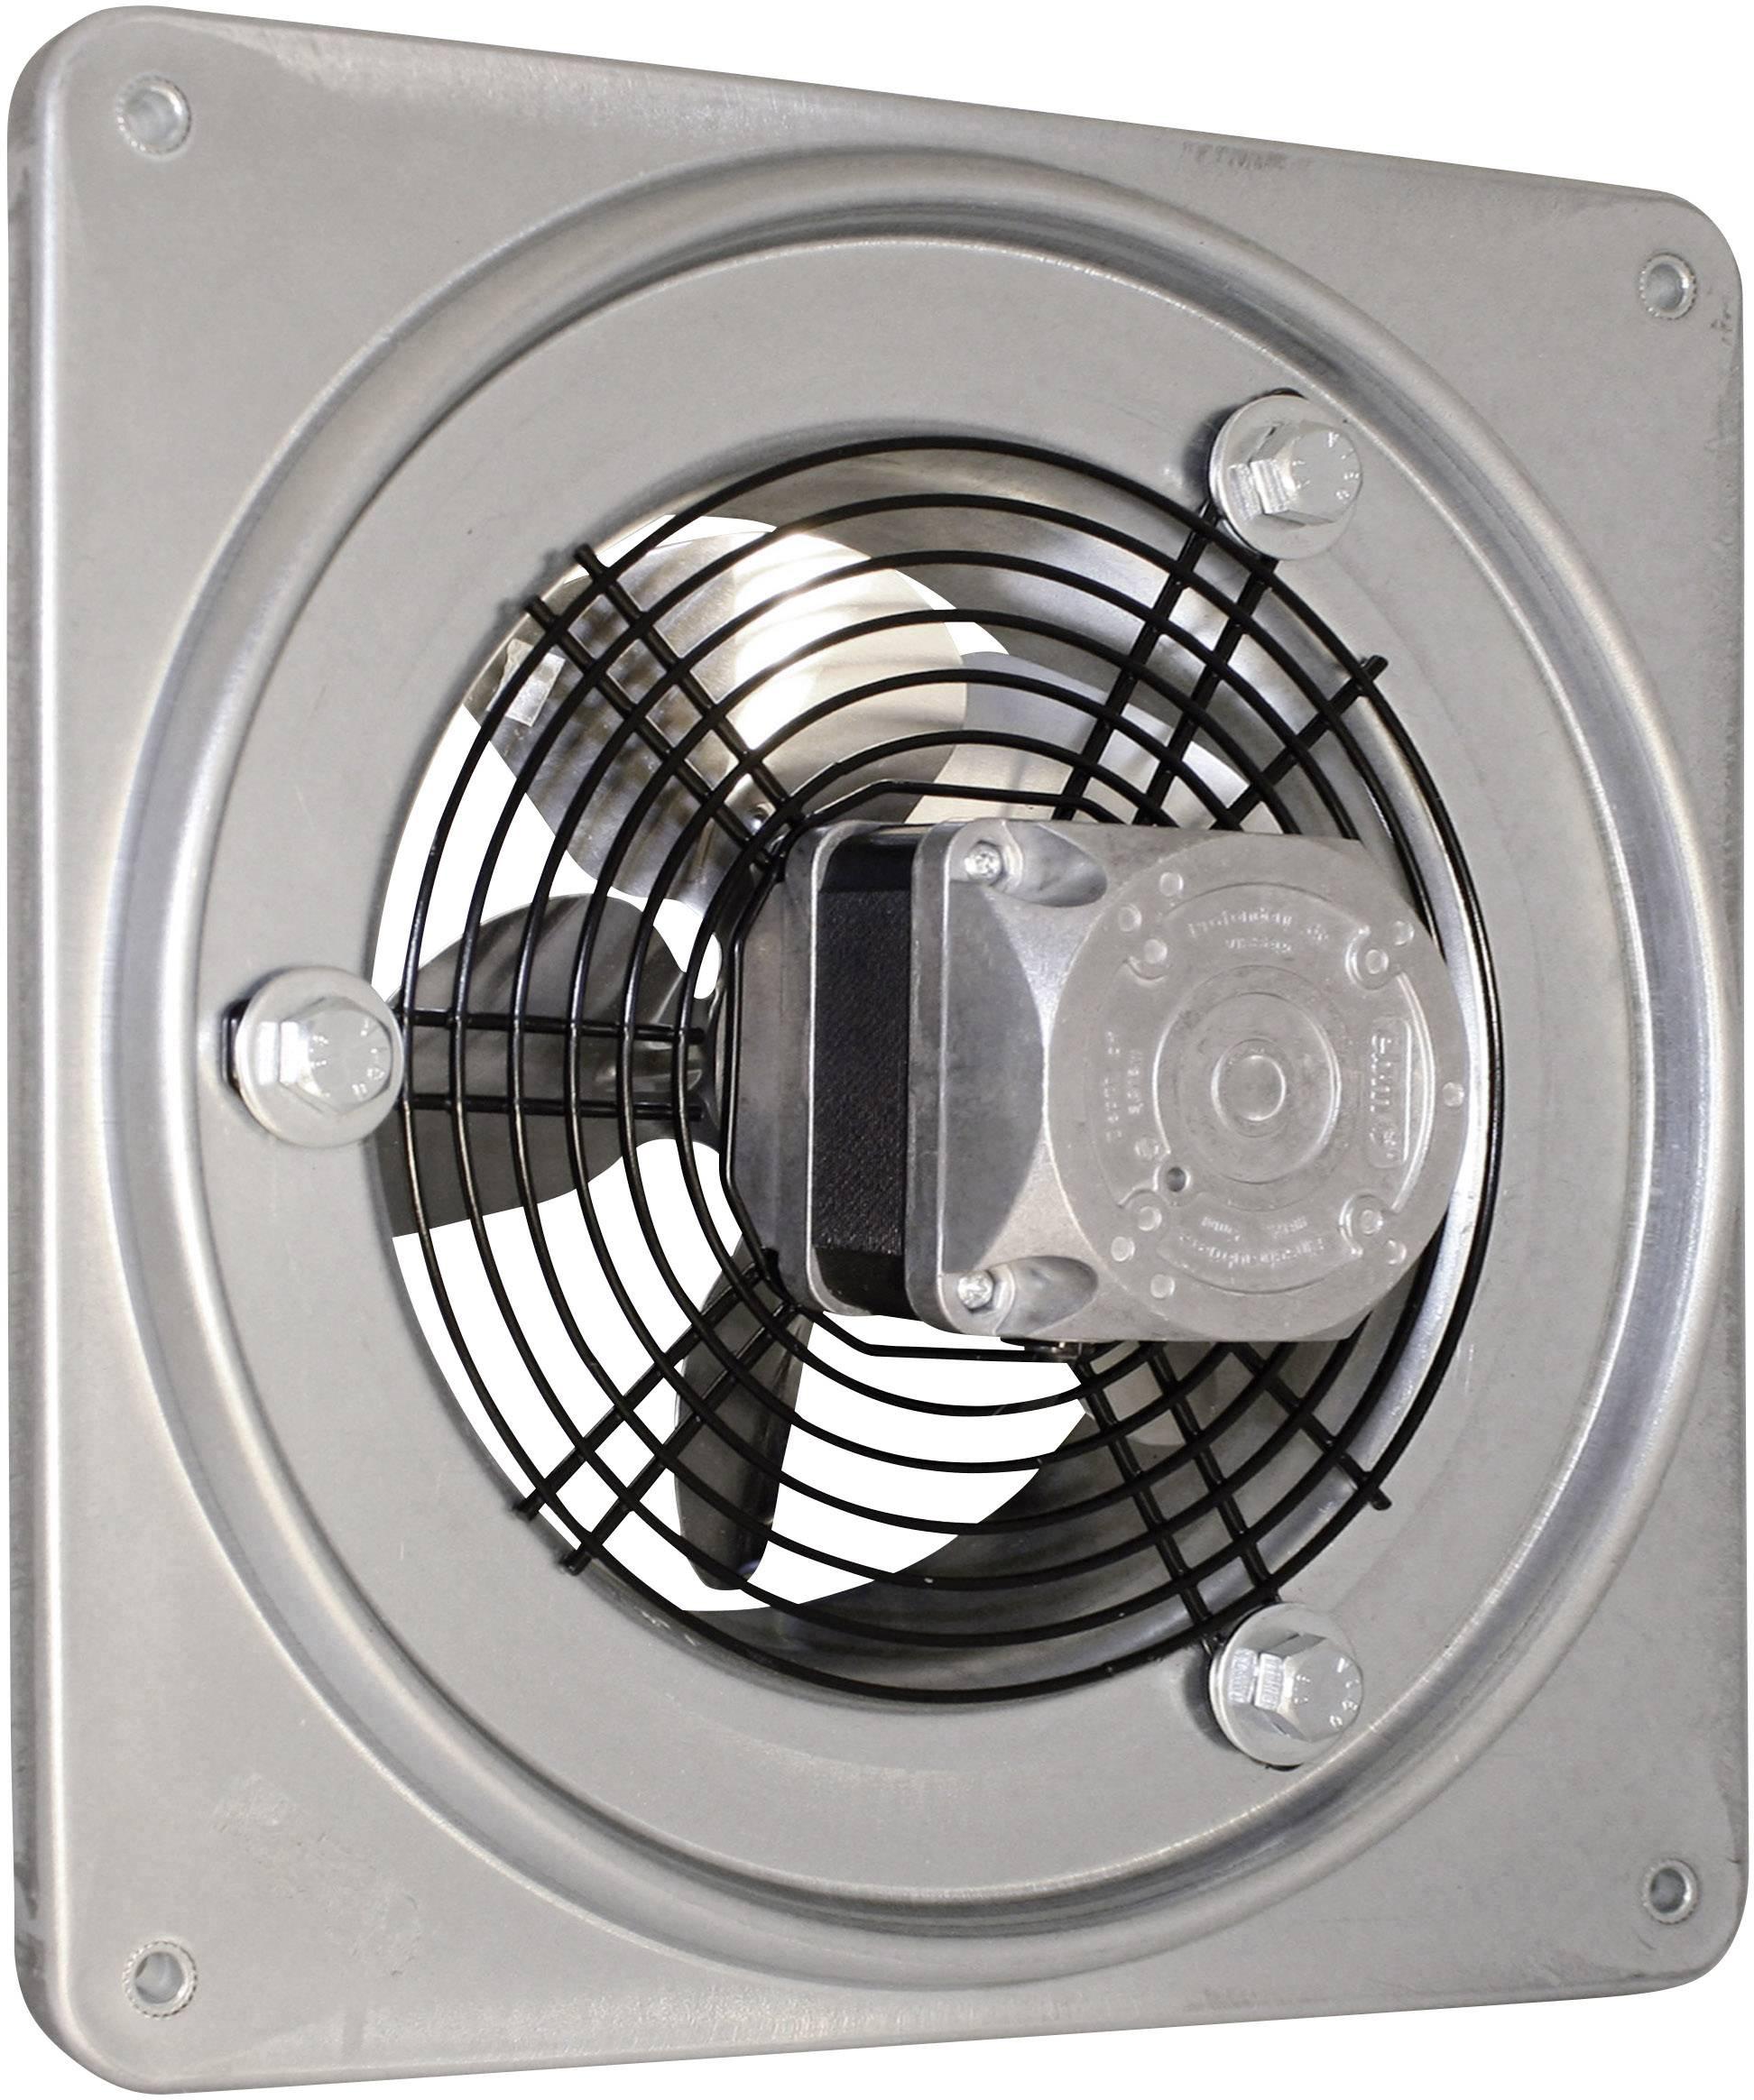 Vestavný ventilátor Basic 20, 40062, 230 V, 475 m3/h, 29 cm